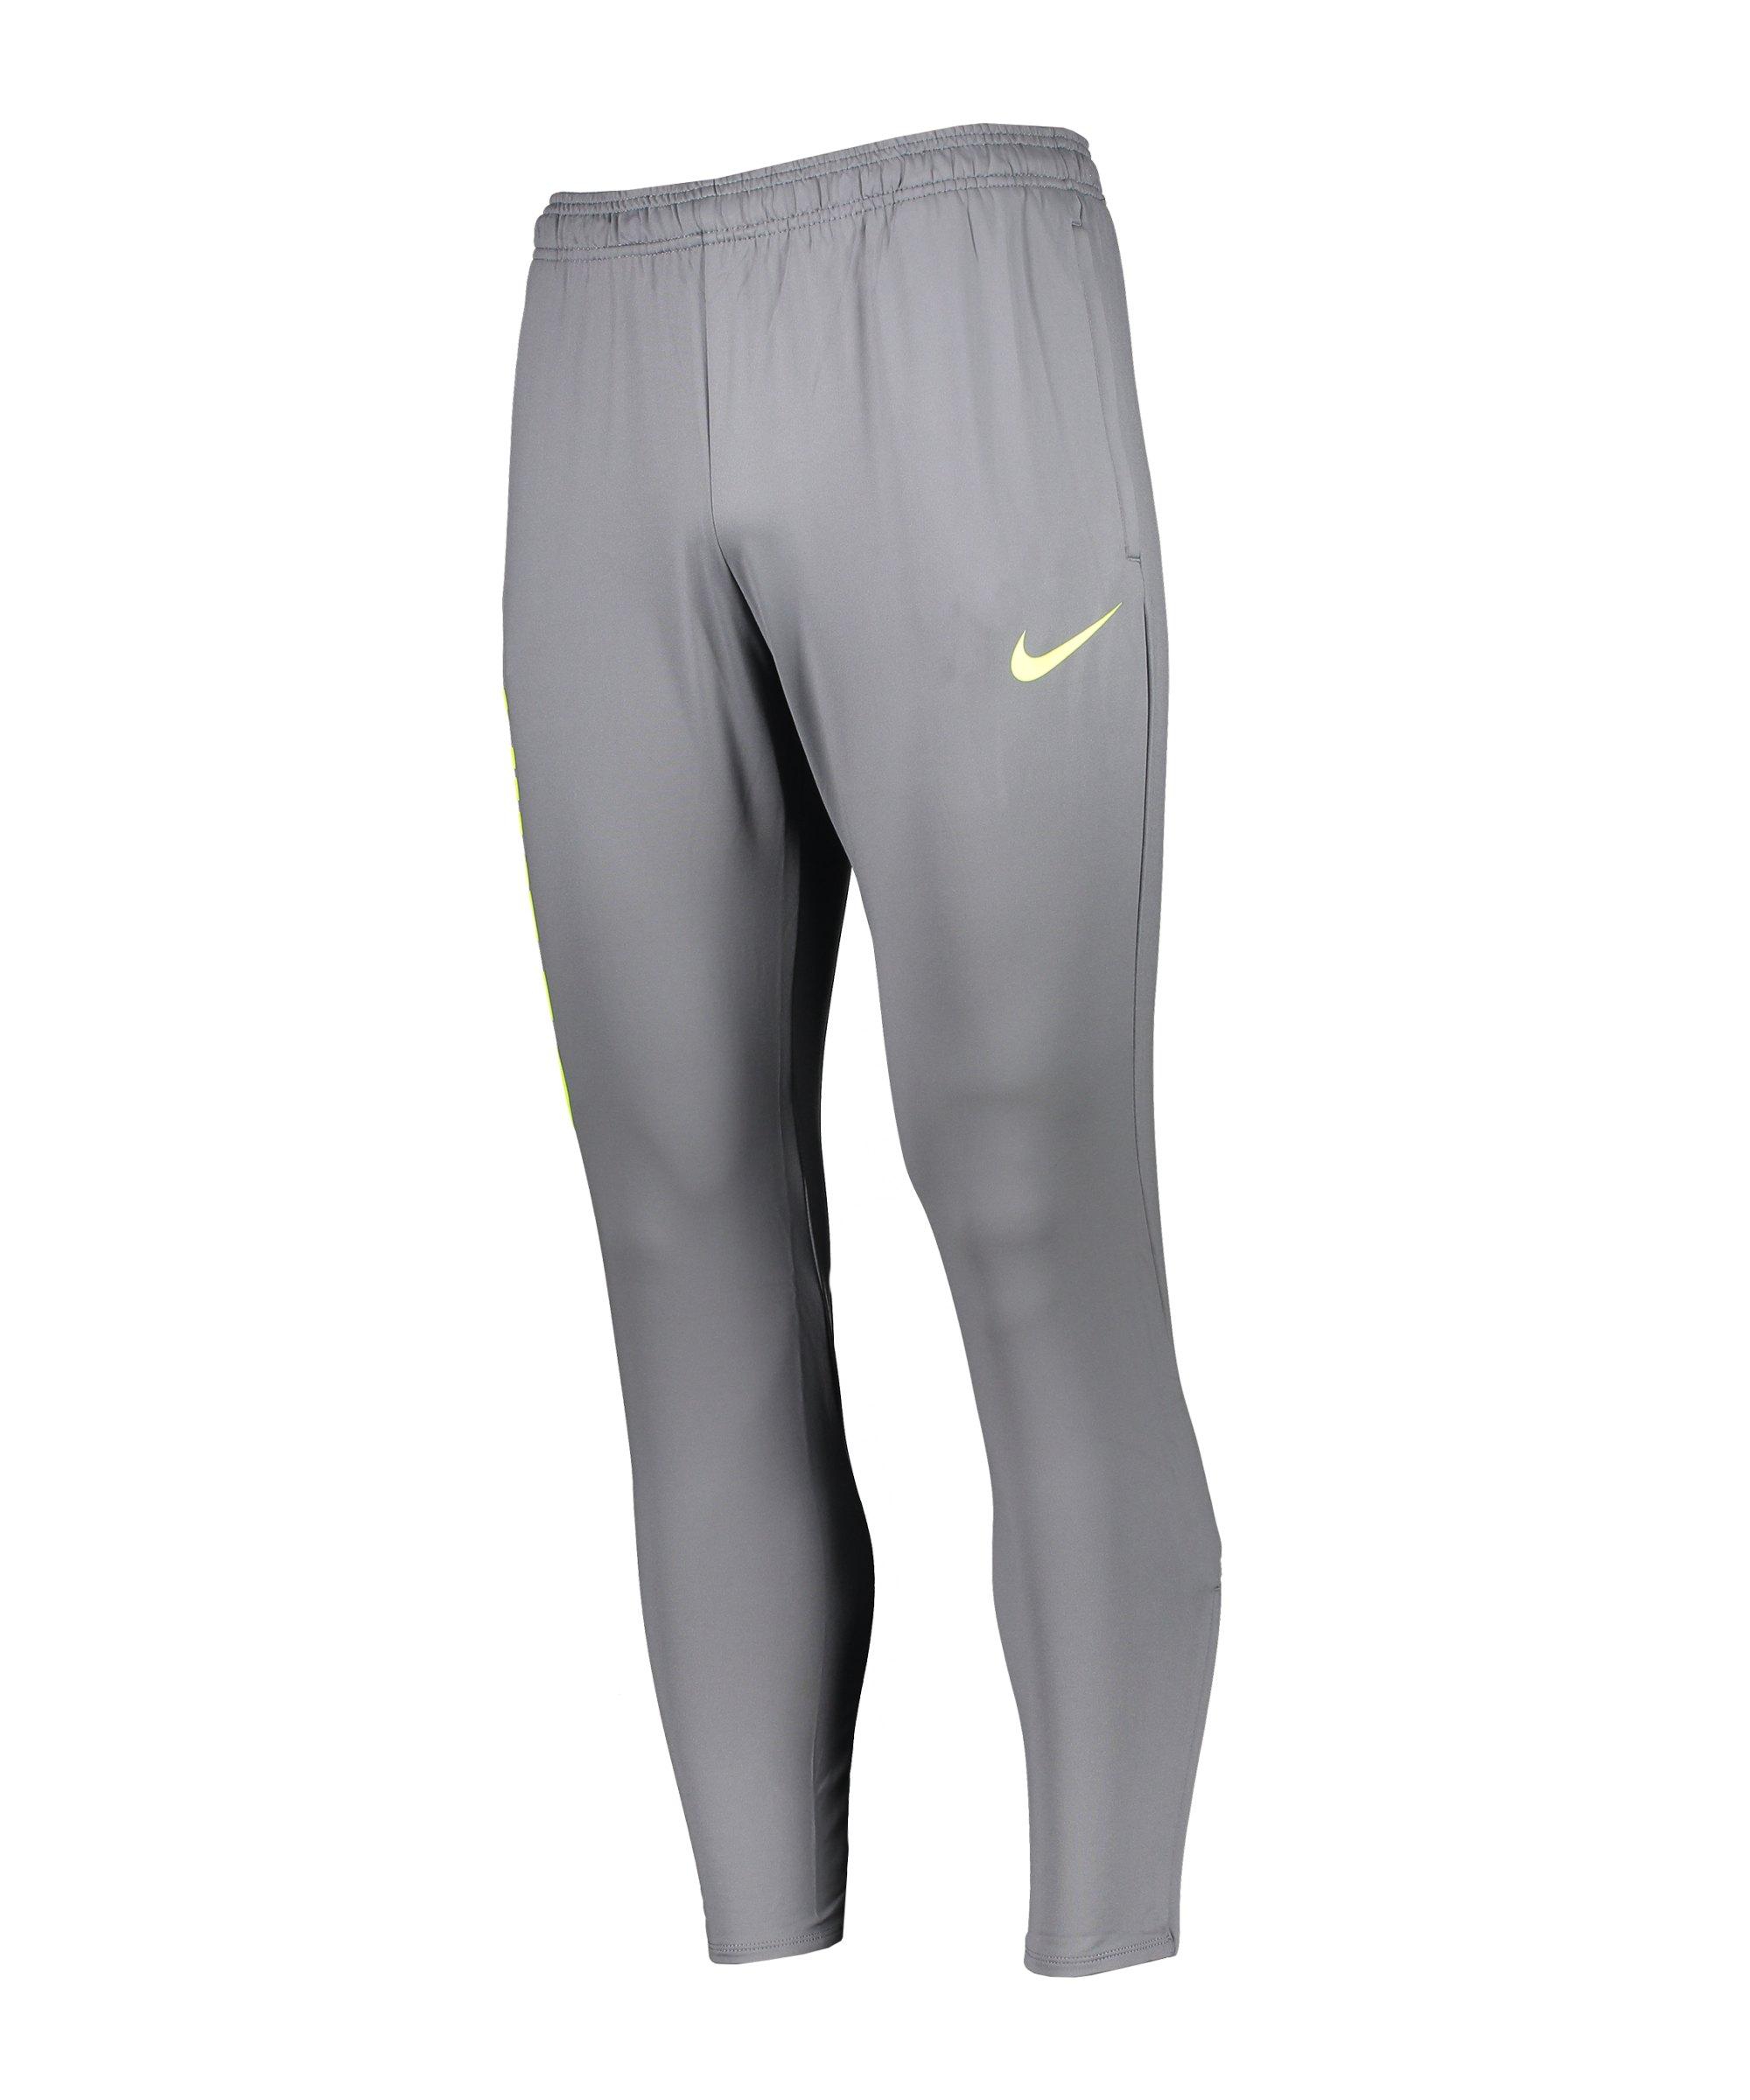 Nike F.C. Essential Jogginghose Grau F084 - grau